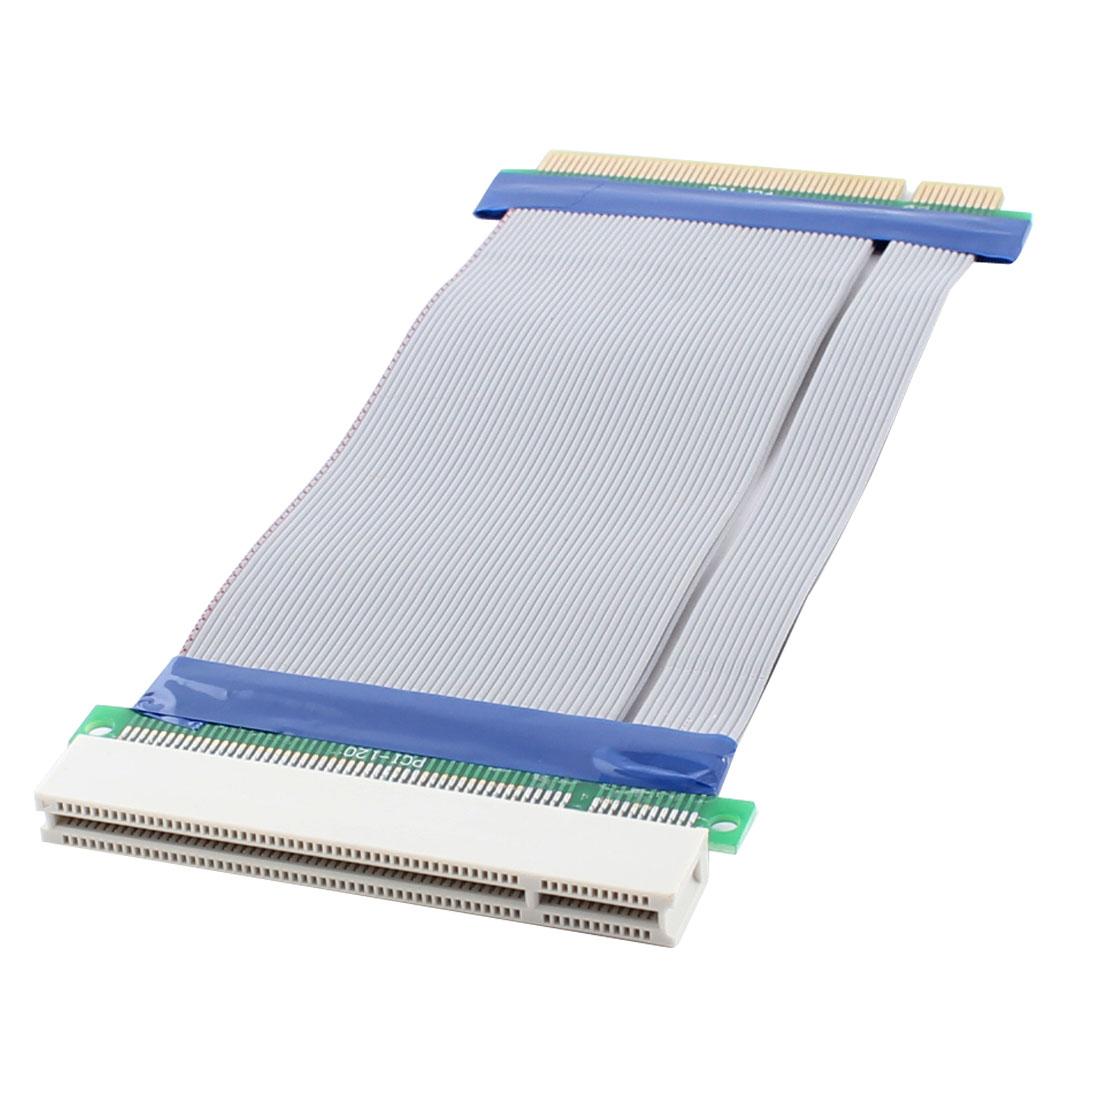 PCI 32 Bit Adapter Converter Riser Card Extender Flexible Ribbon Cable 19.5cm